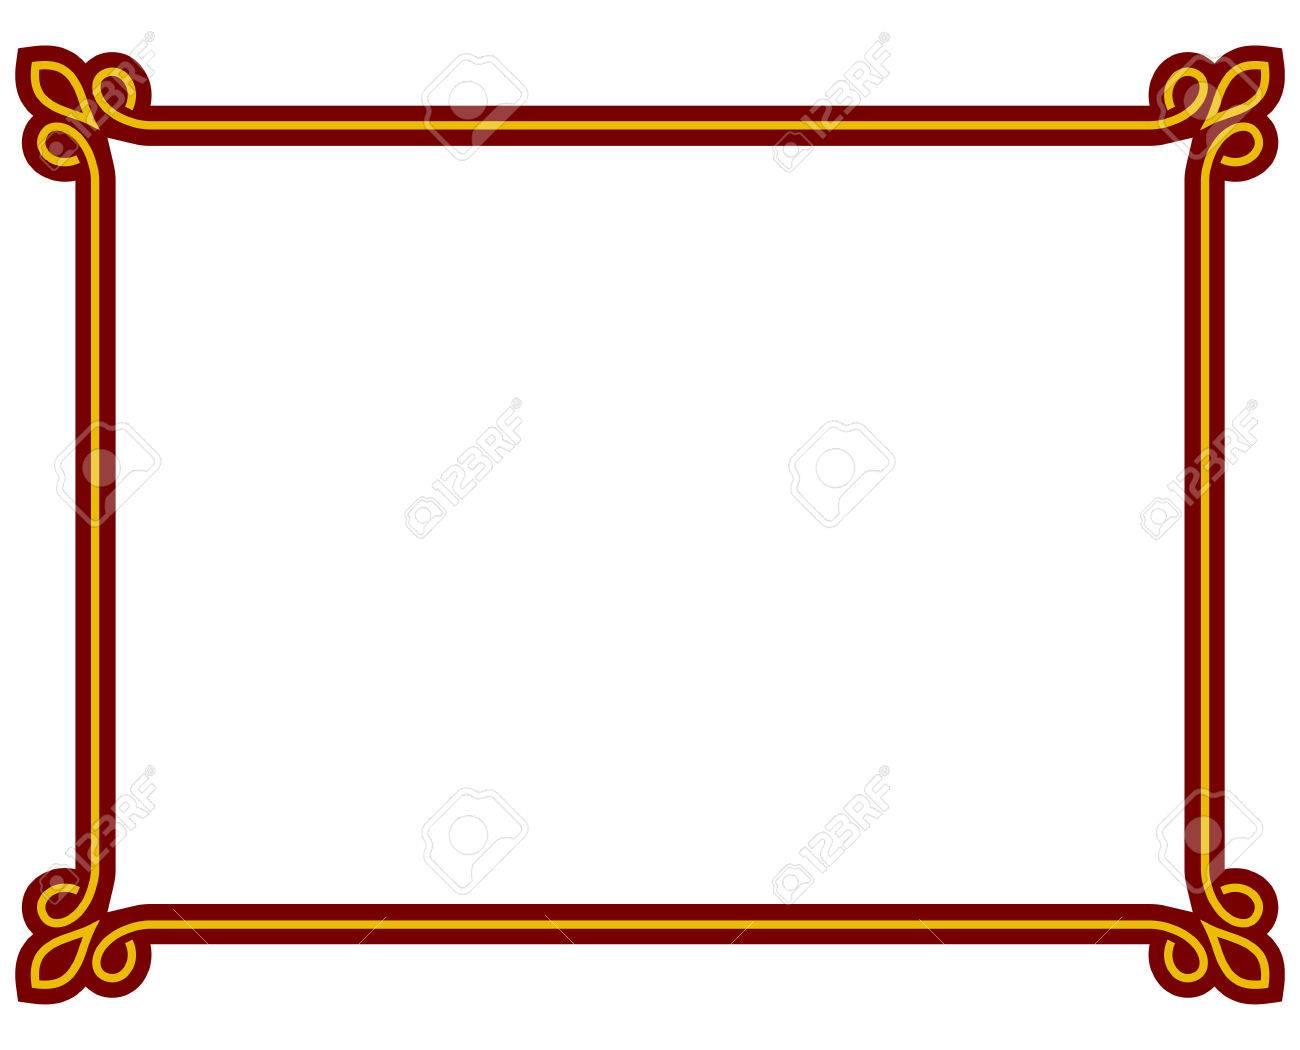 1300x1050 Red Border Frame Deco Plaque. Vector Art Simple Line Corner